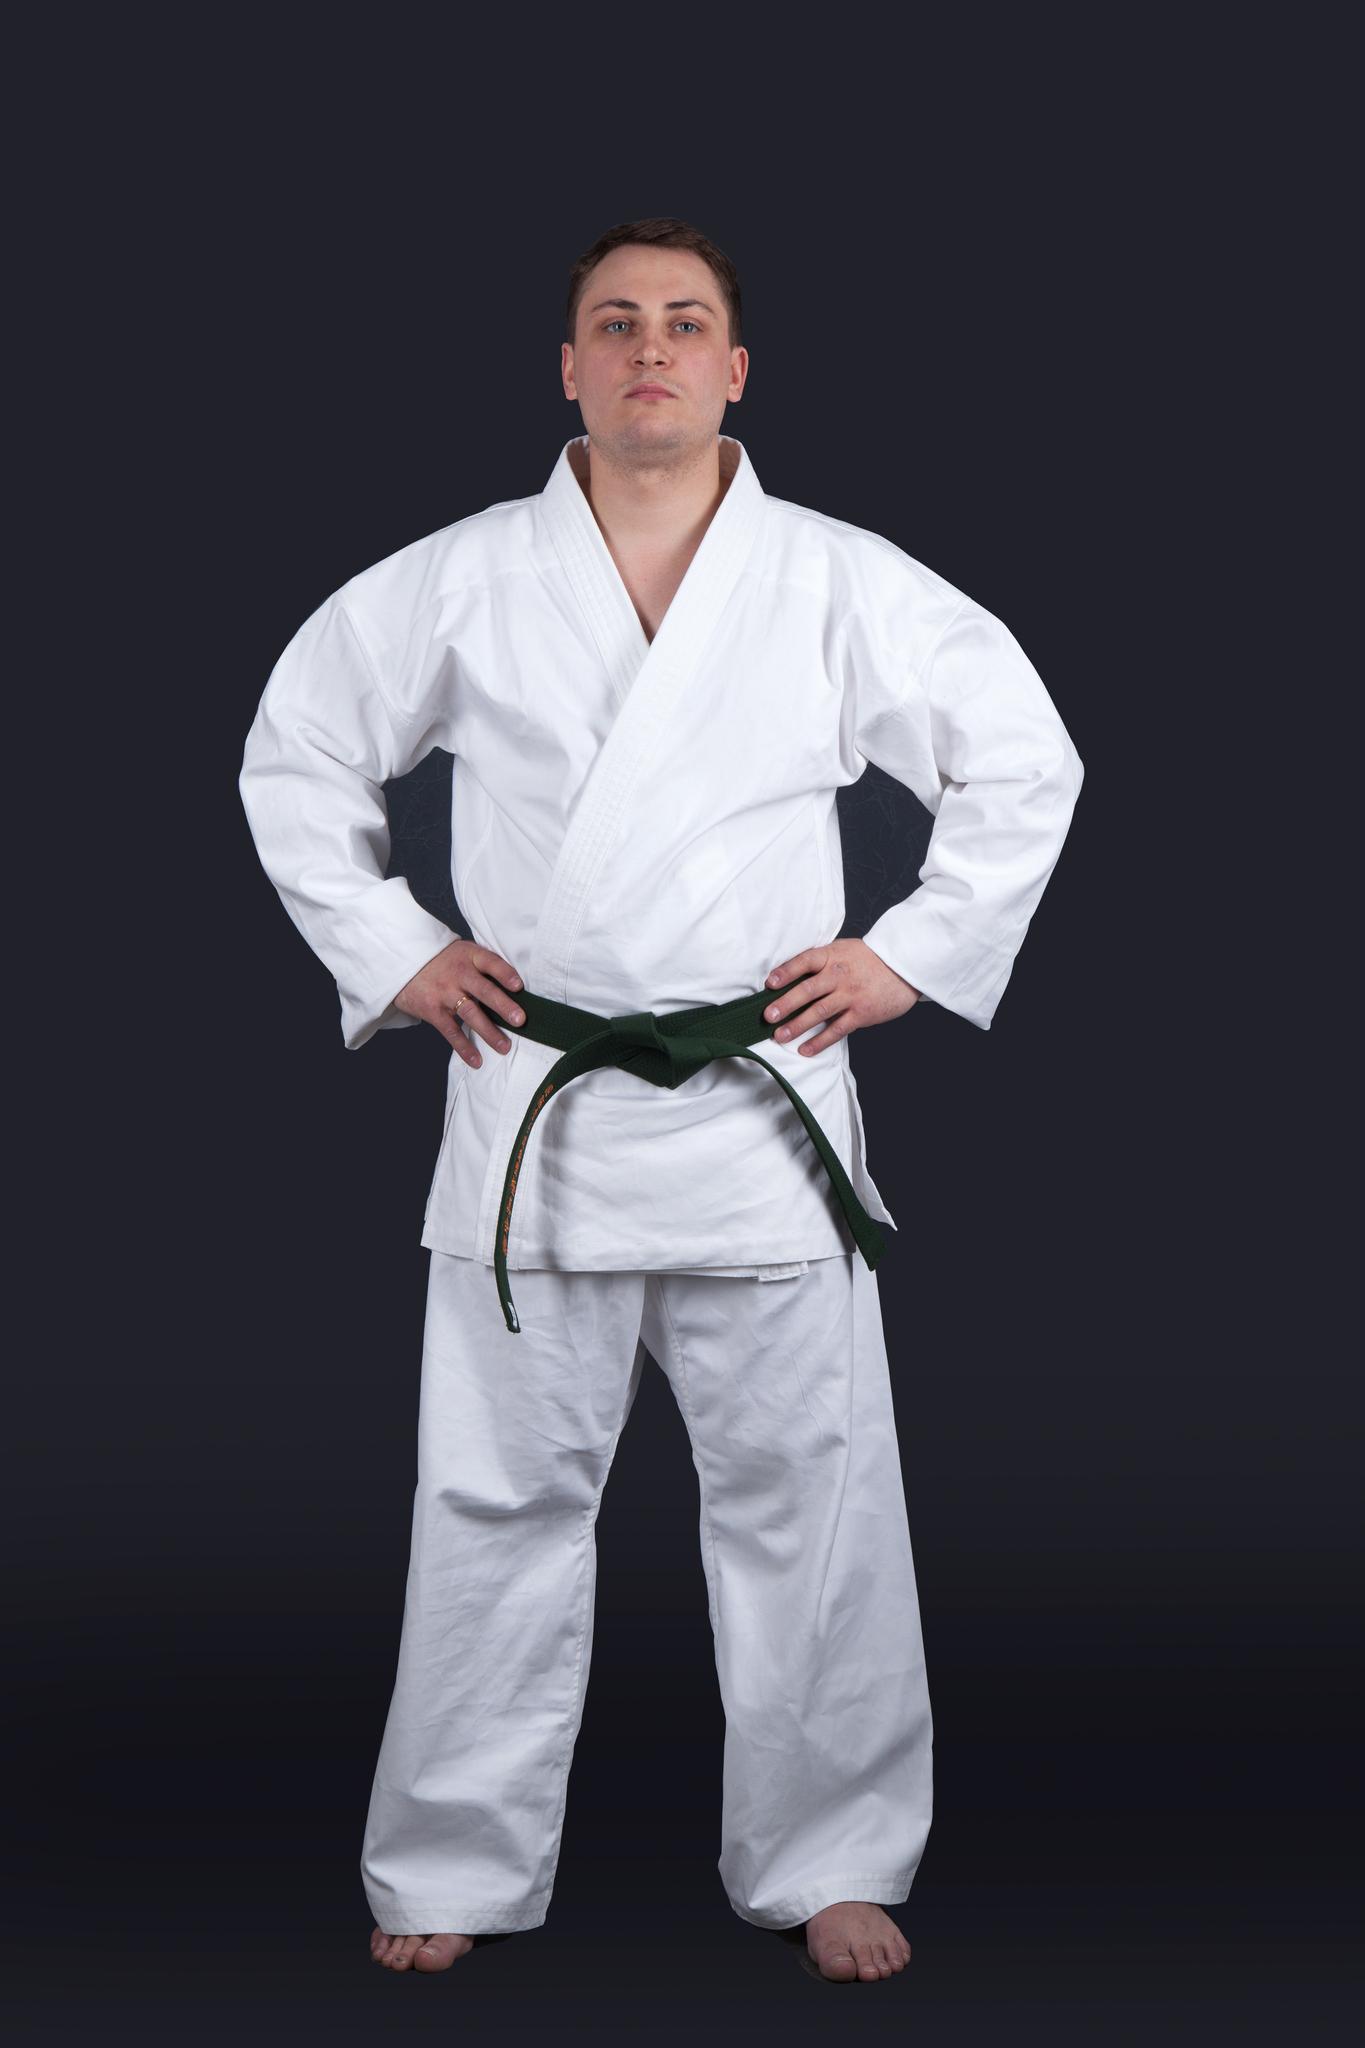 Кимоно / Доги Кимоно для Каратэ, Рукопашного боя, Айкидо IMG_4673.jpg